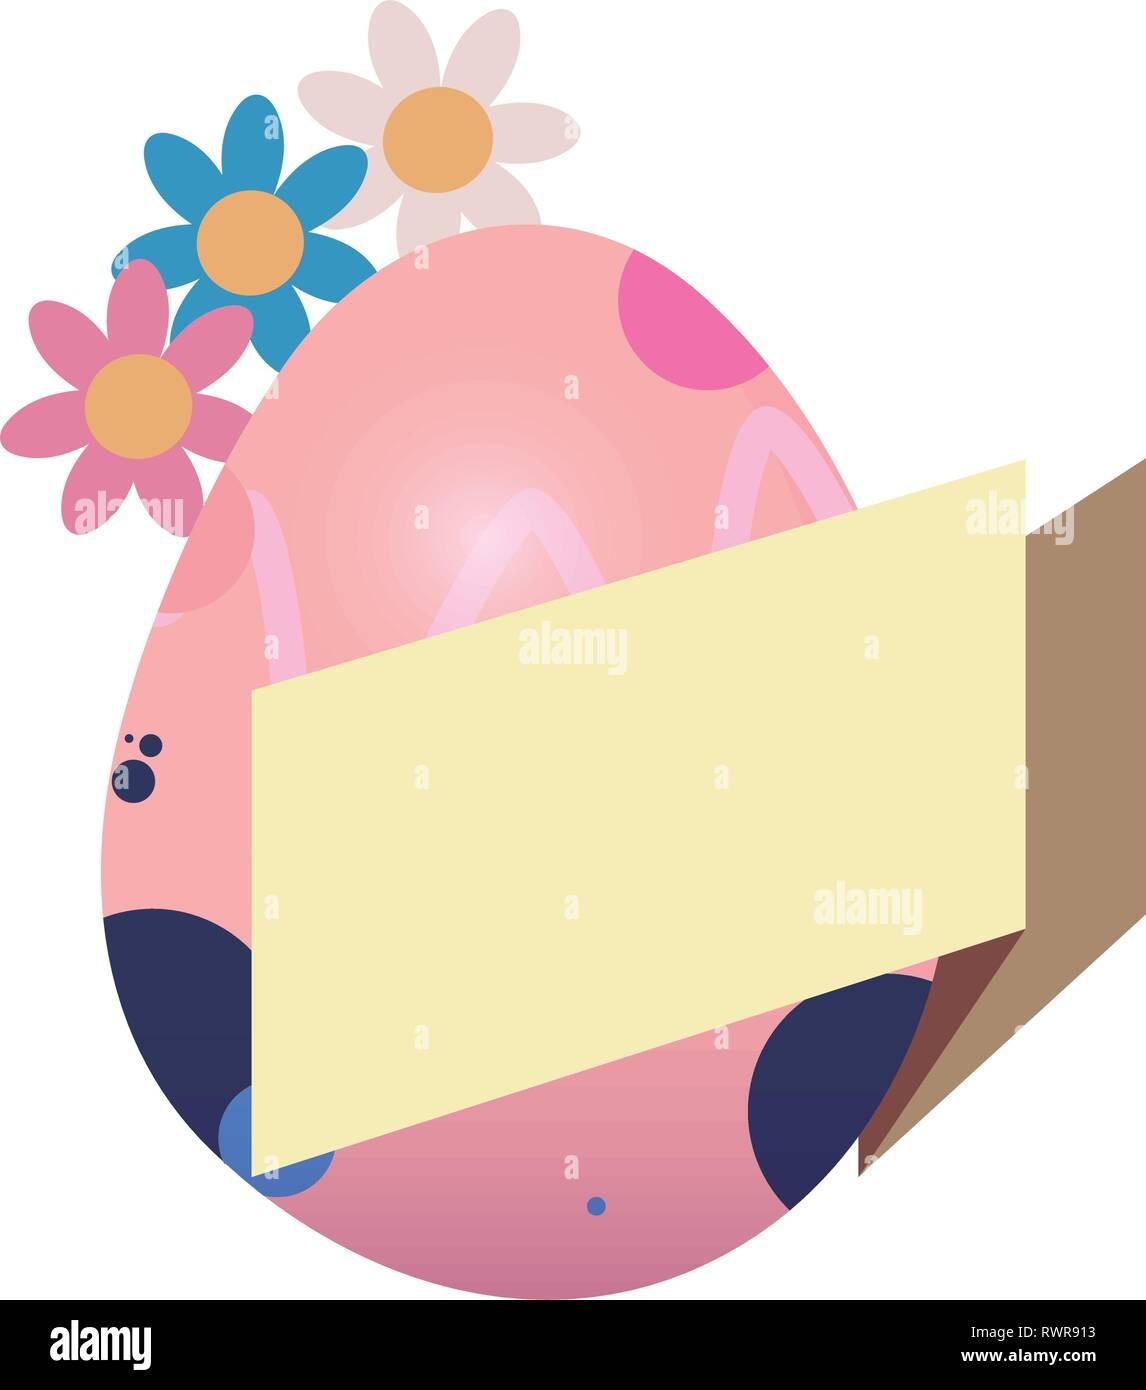 egg decorating banner flowers happy easter vector illustration - Stock Vector